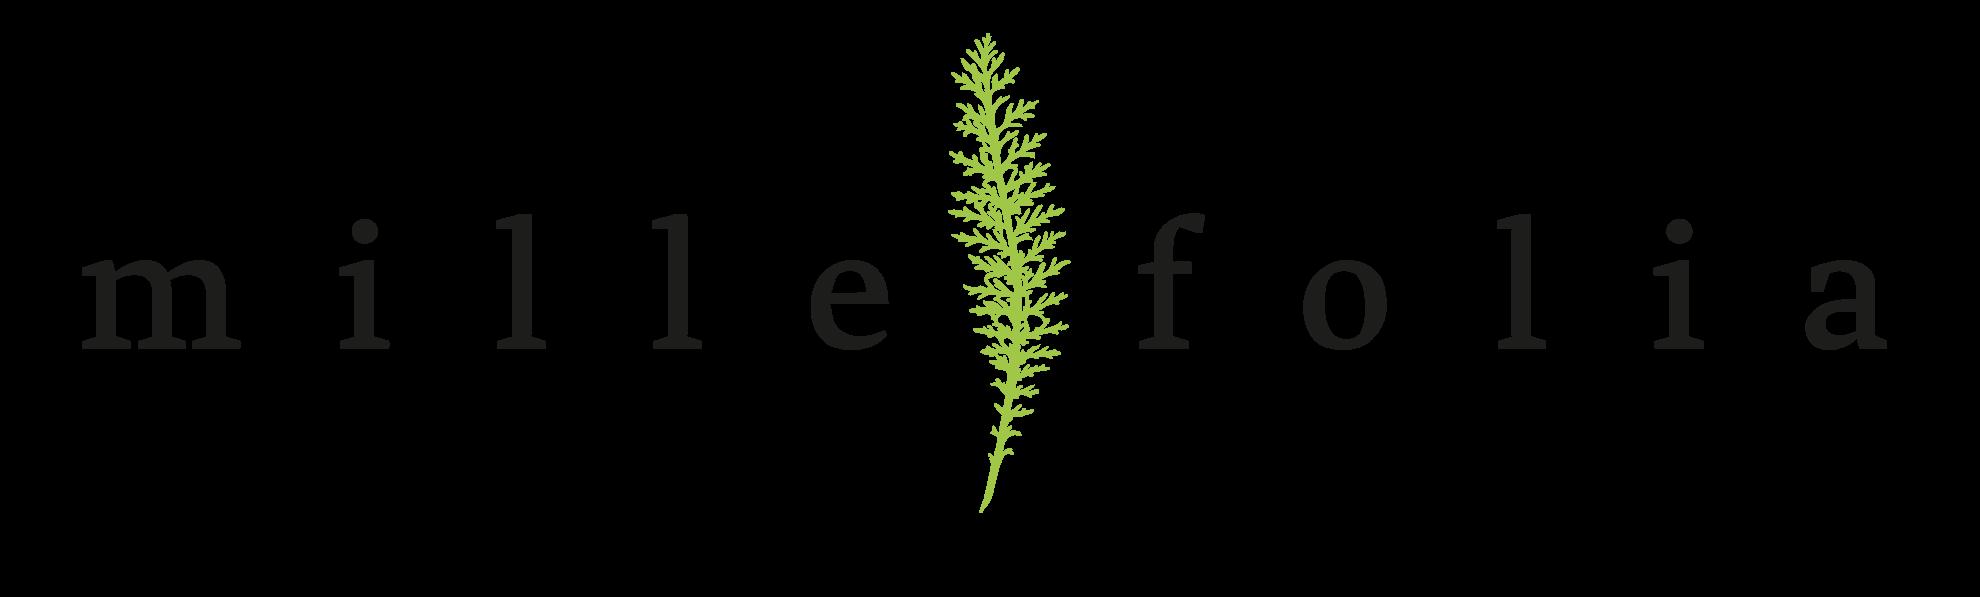 Millefolia